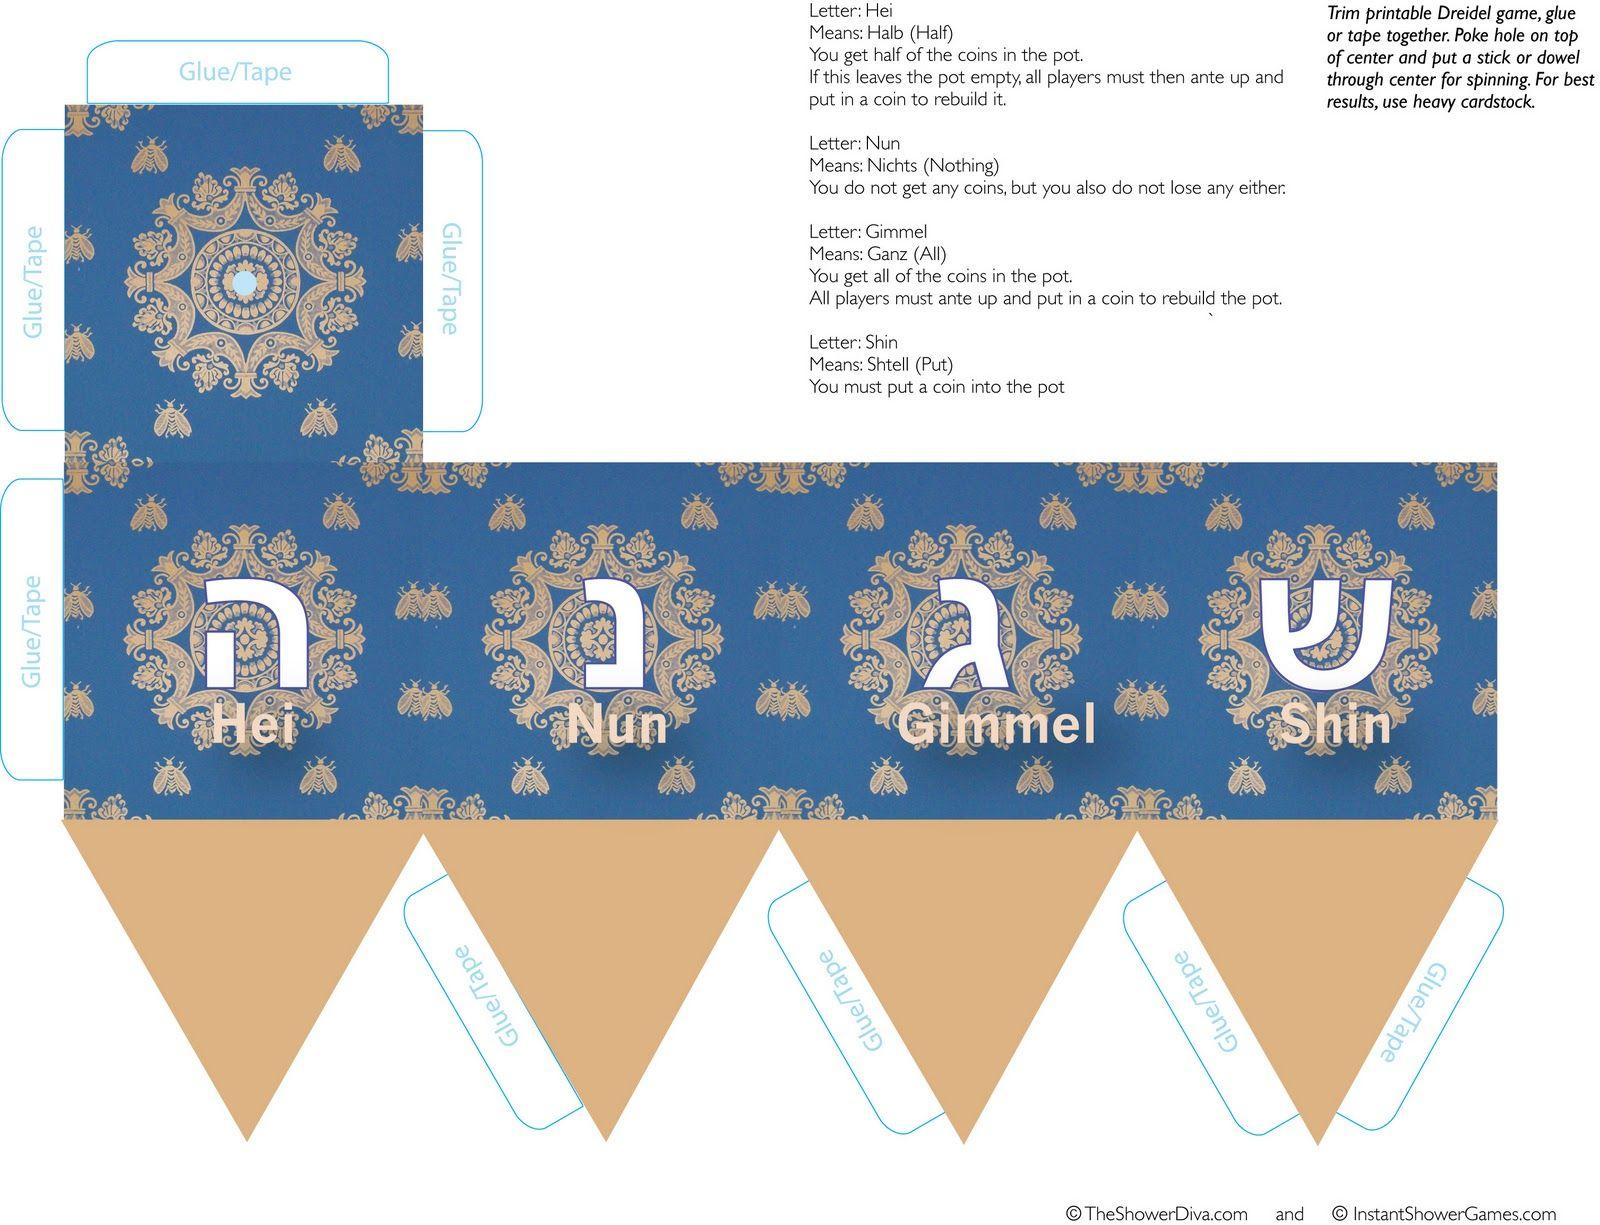 Free Printable Dreidel Pattern For Dreidel Paper Game - The